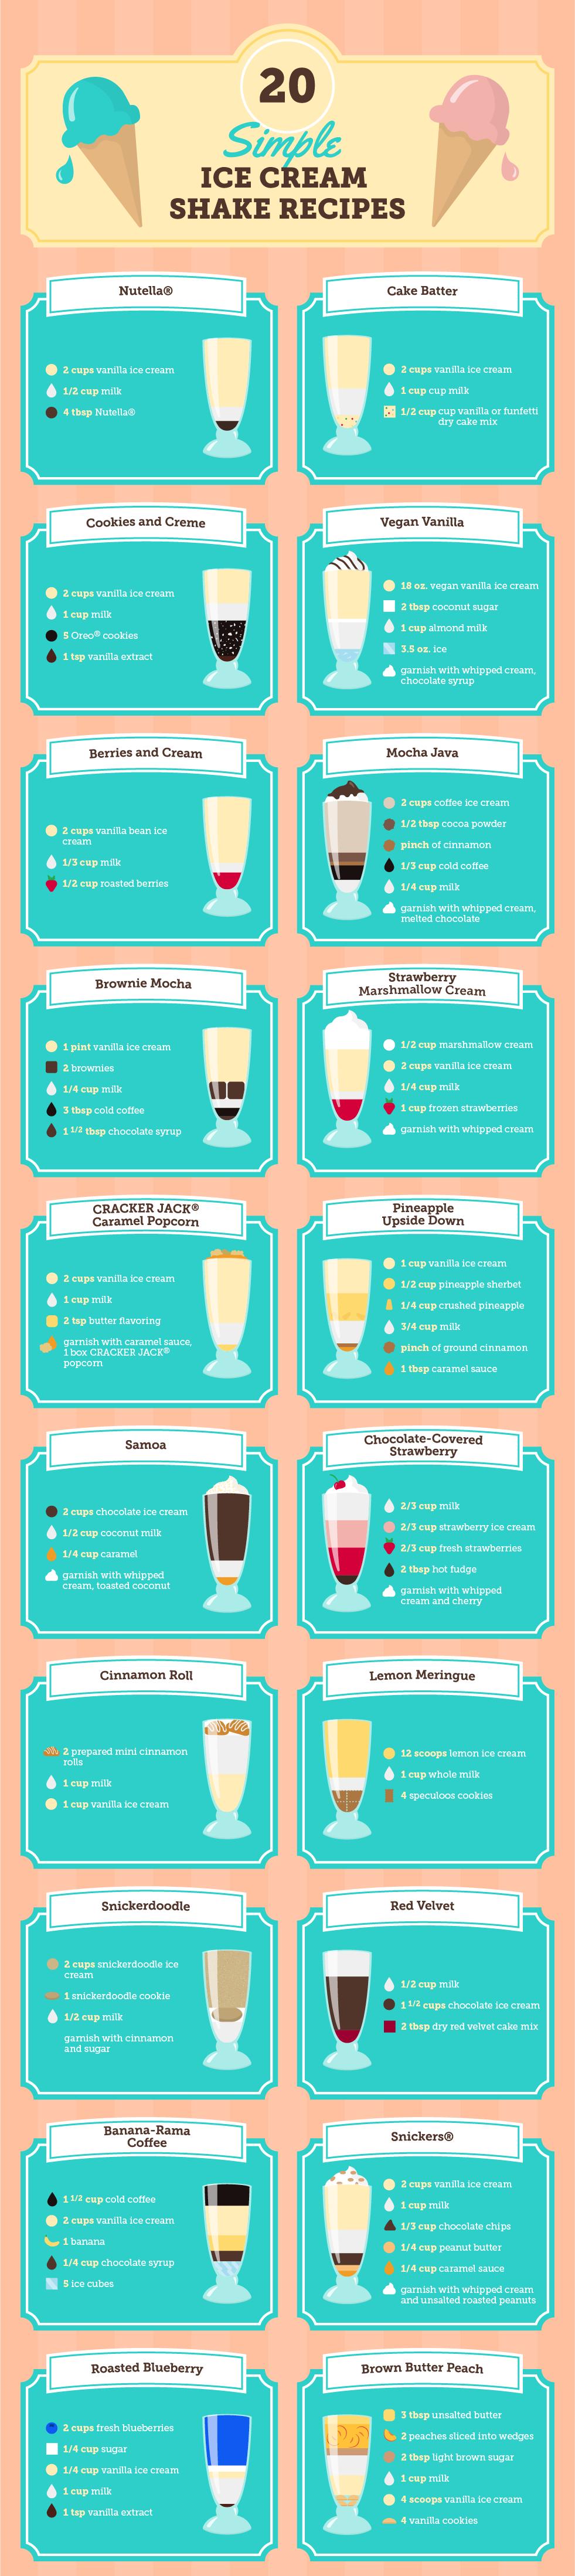 20 Simple Ice Cream Shake Recipes